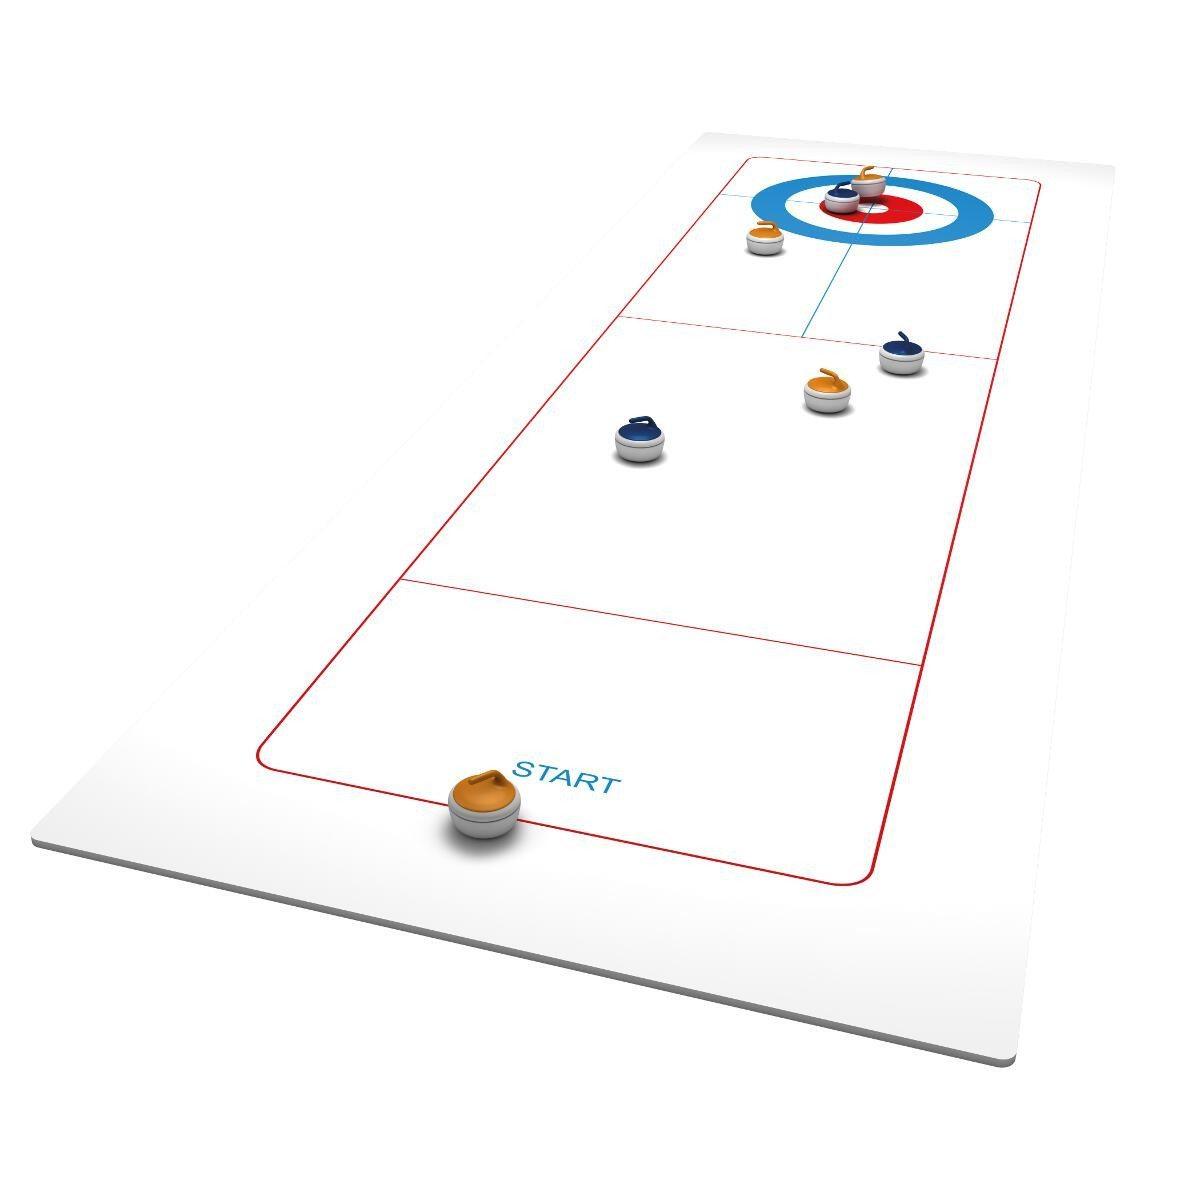 Tisch-Curling